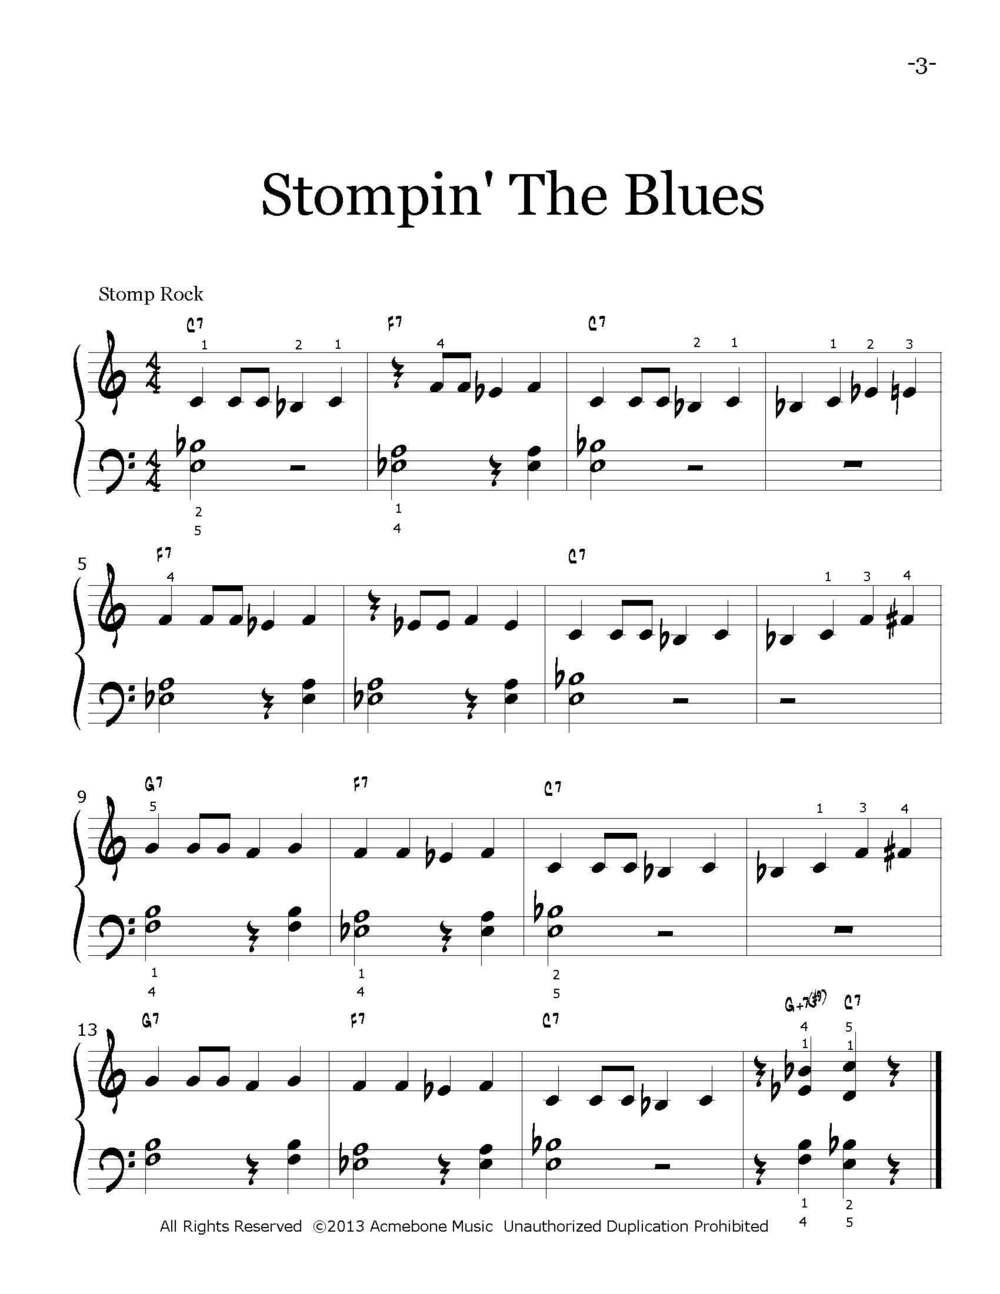 Stompin' The Blues